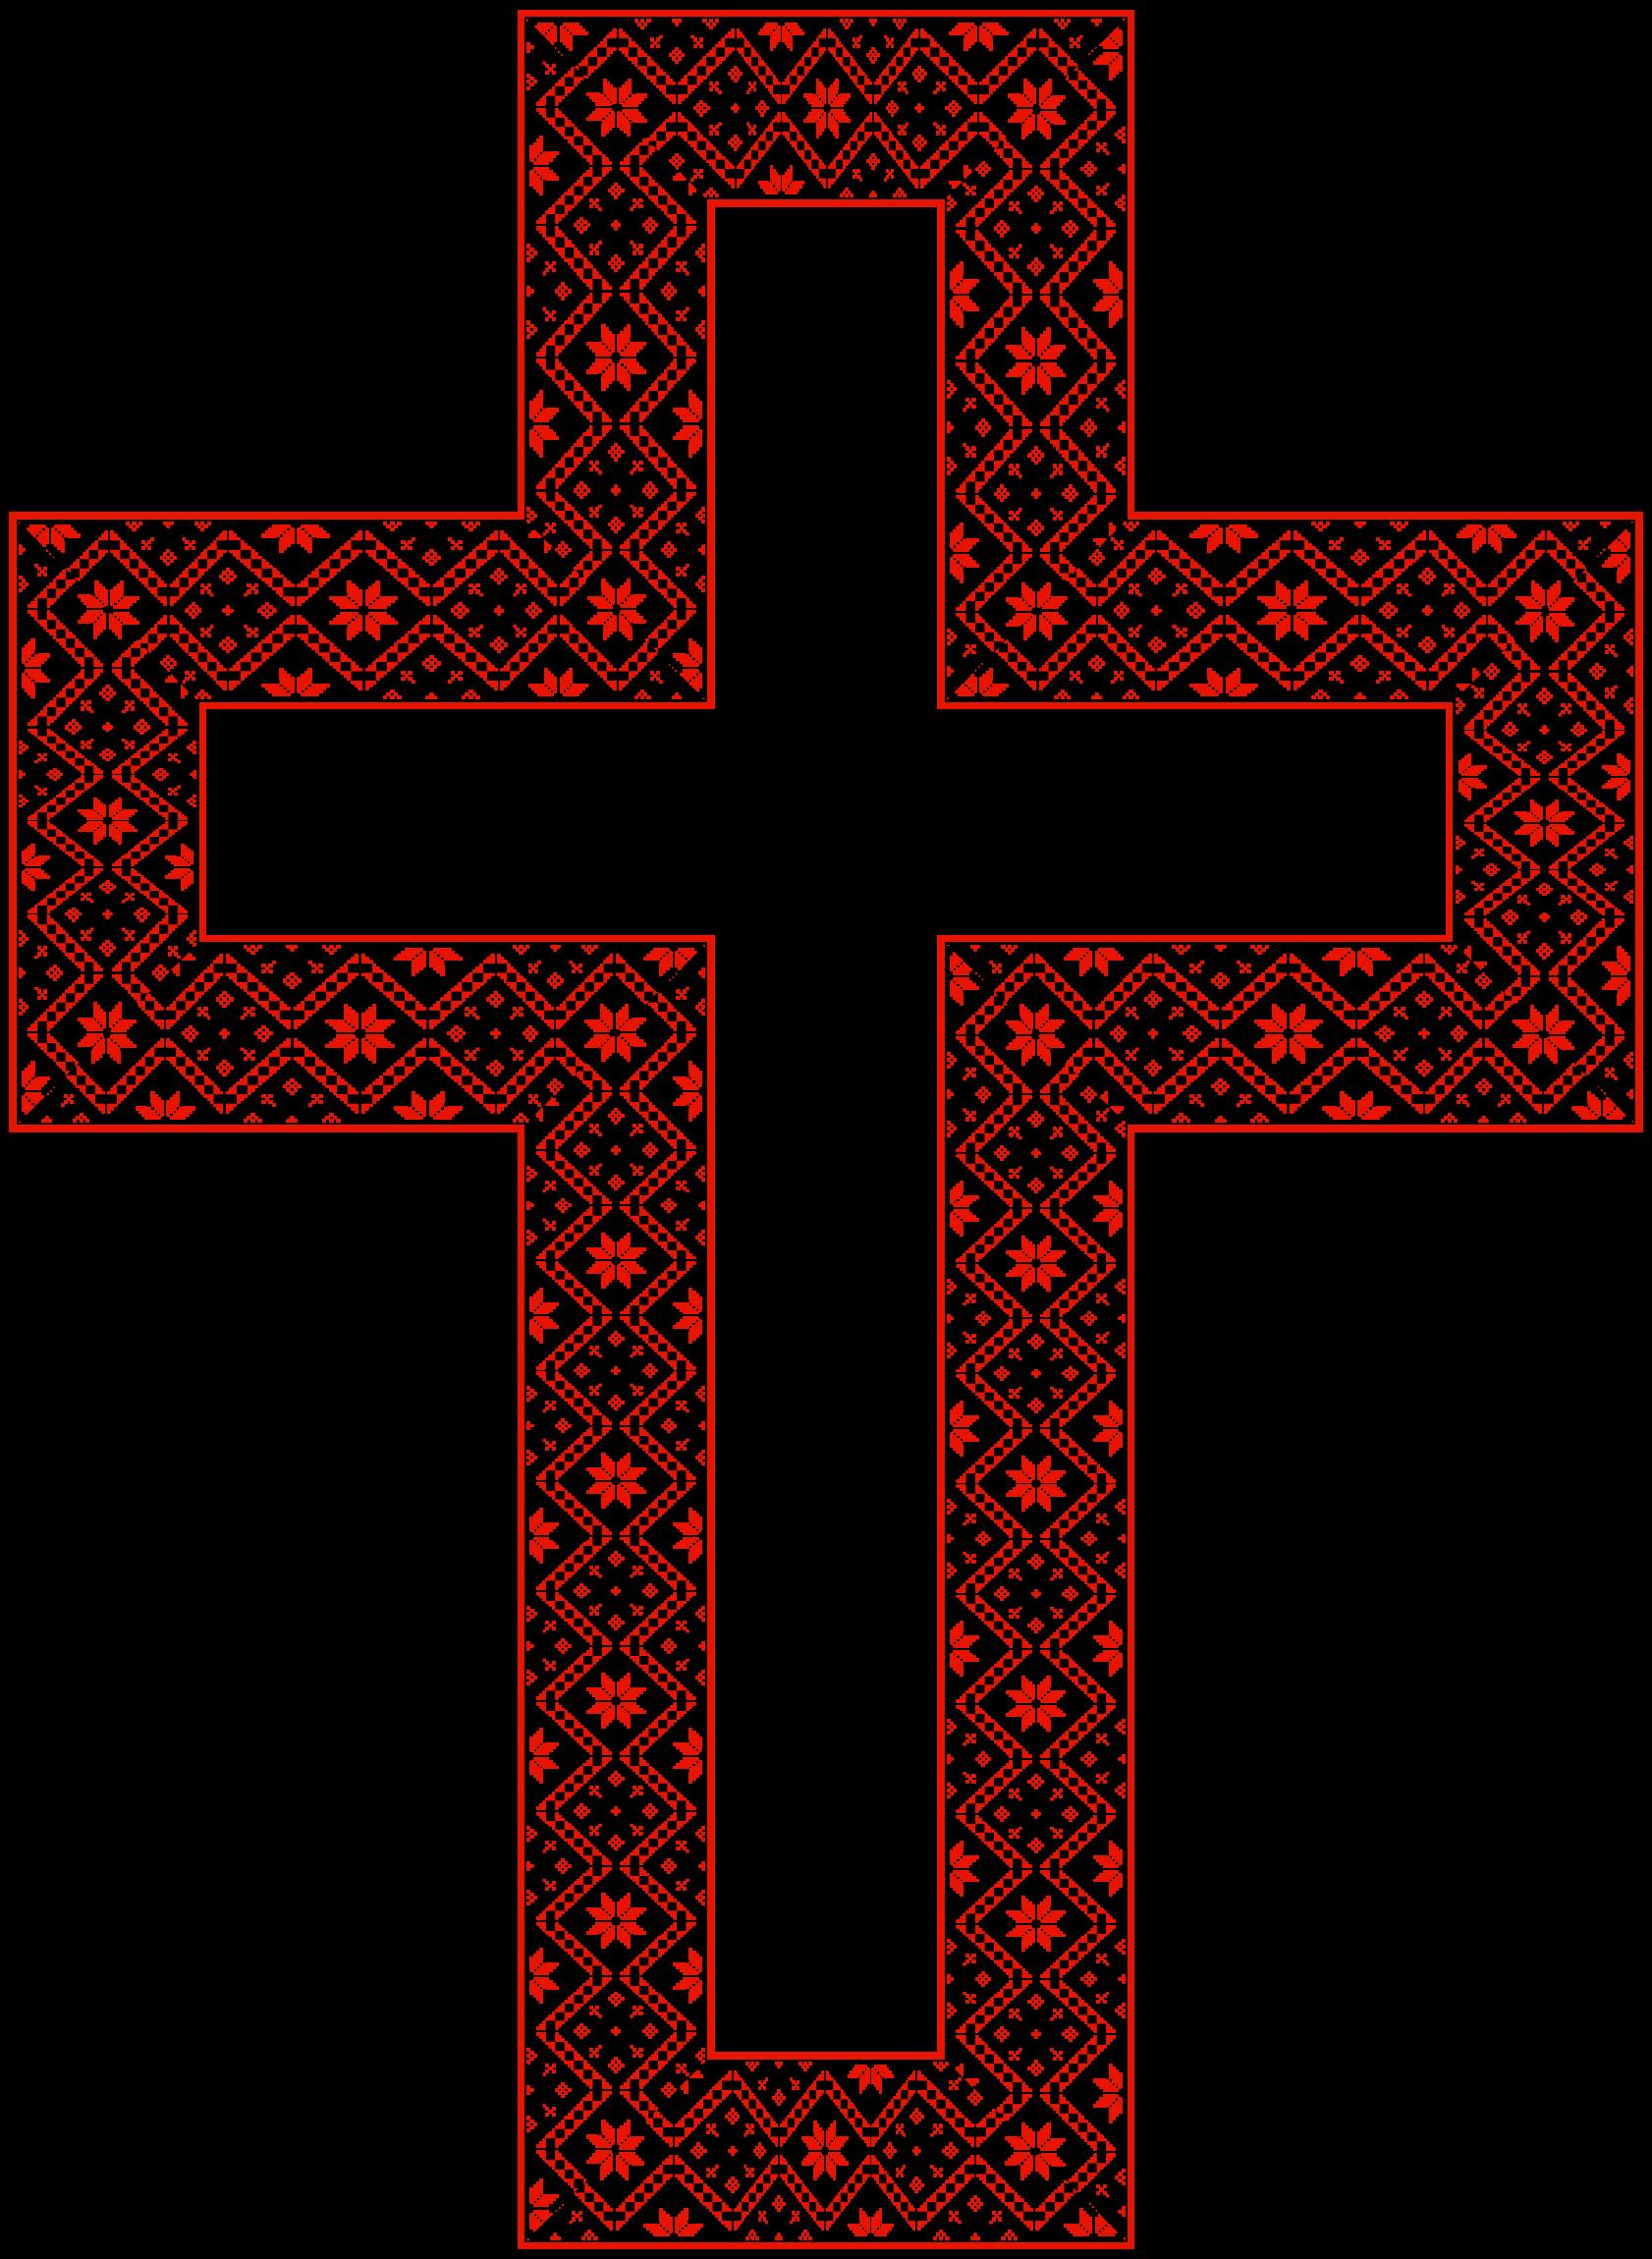 Crucifix clipart ornate cross. Floral big image png